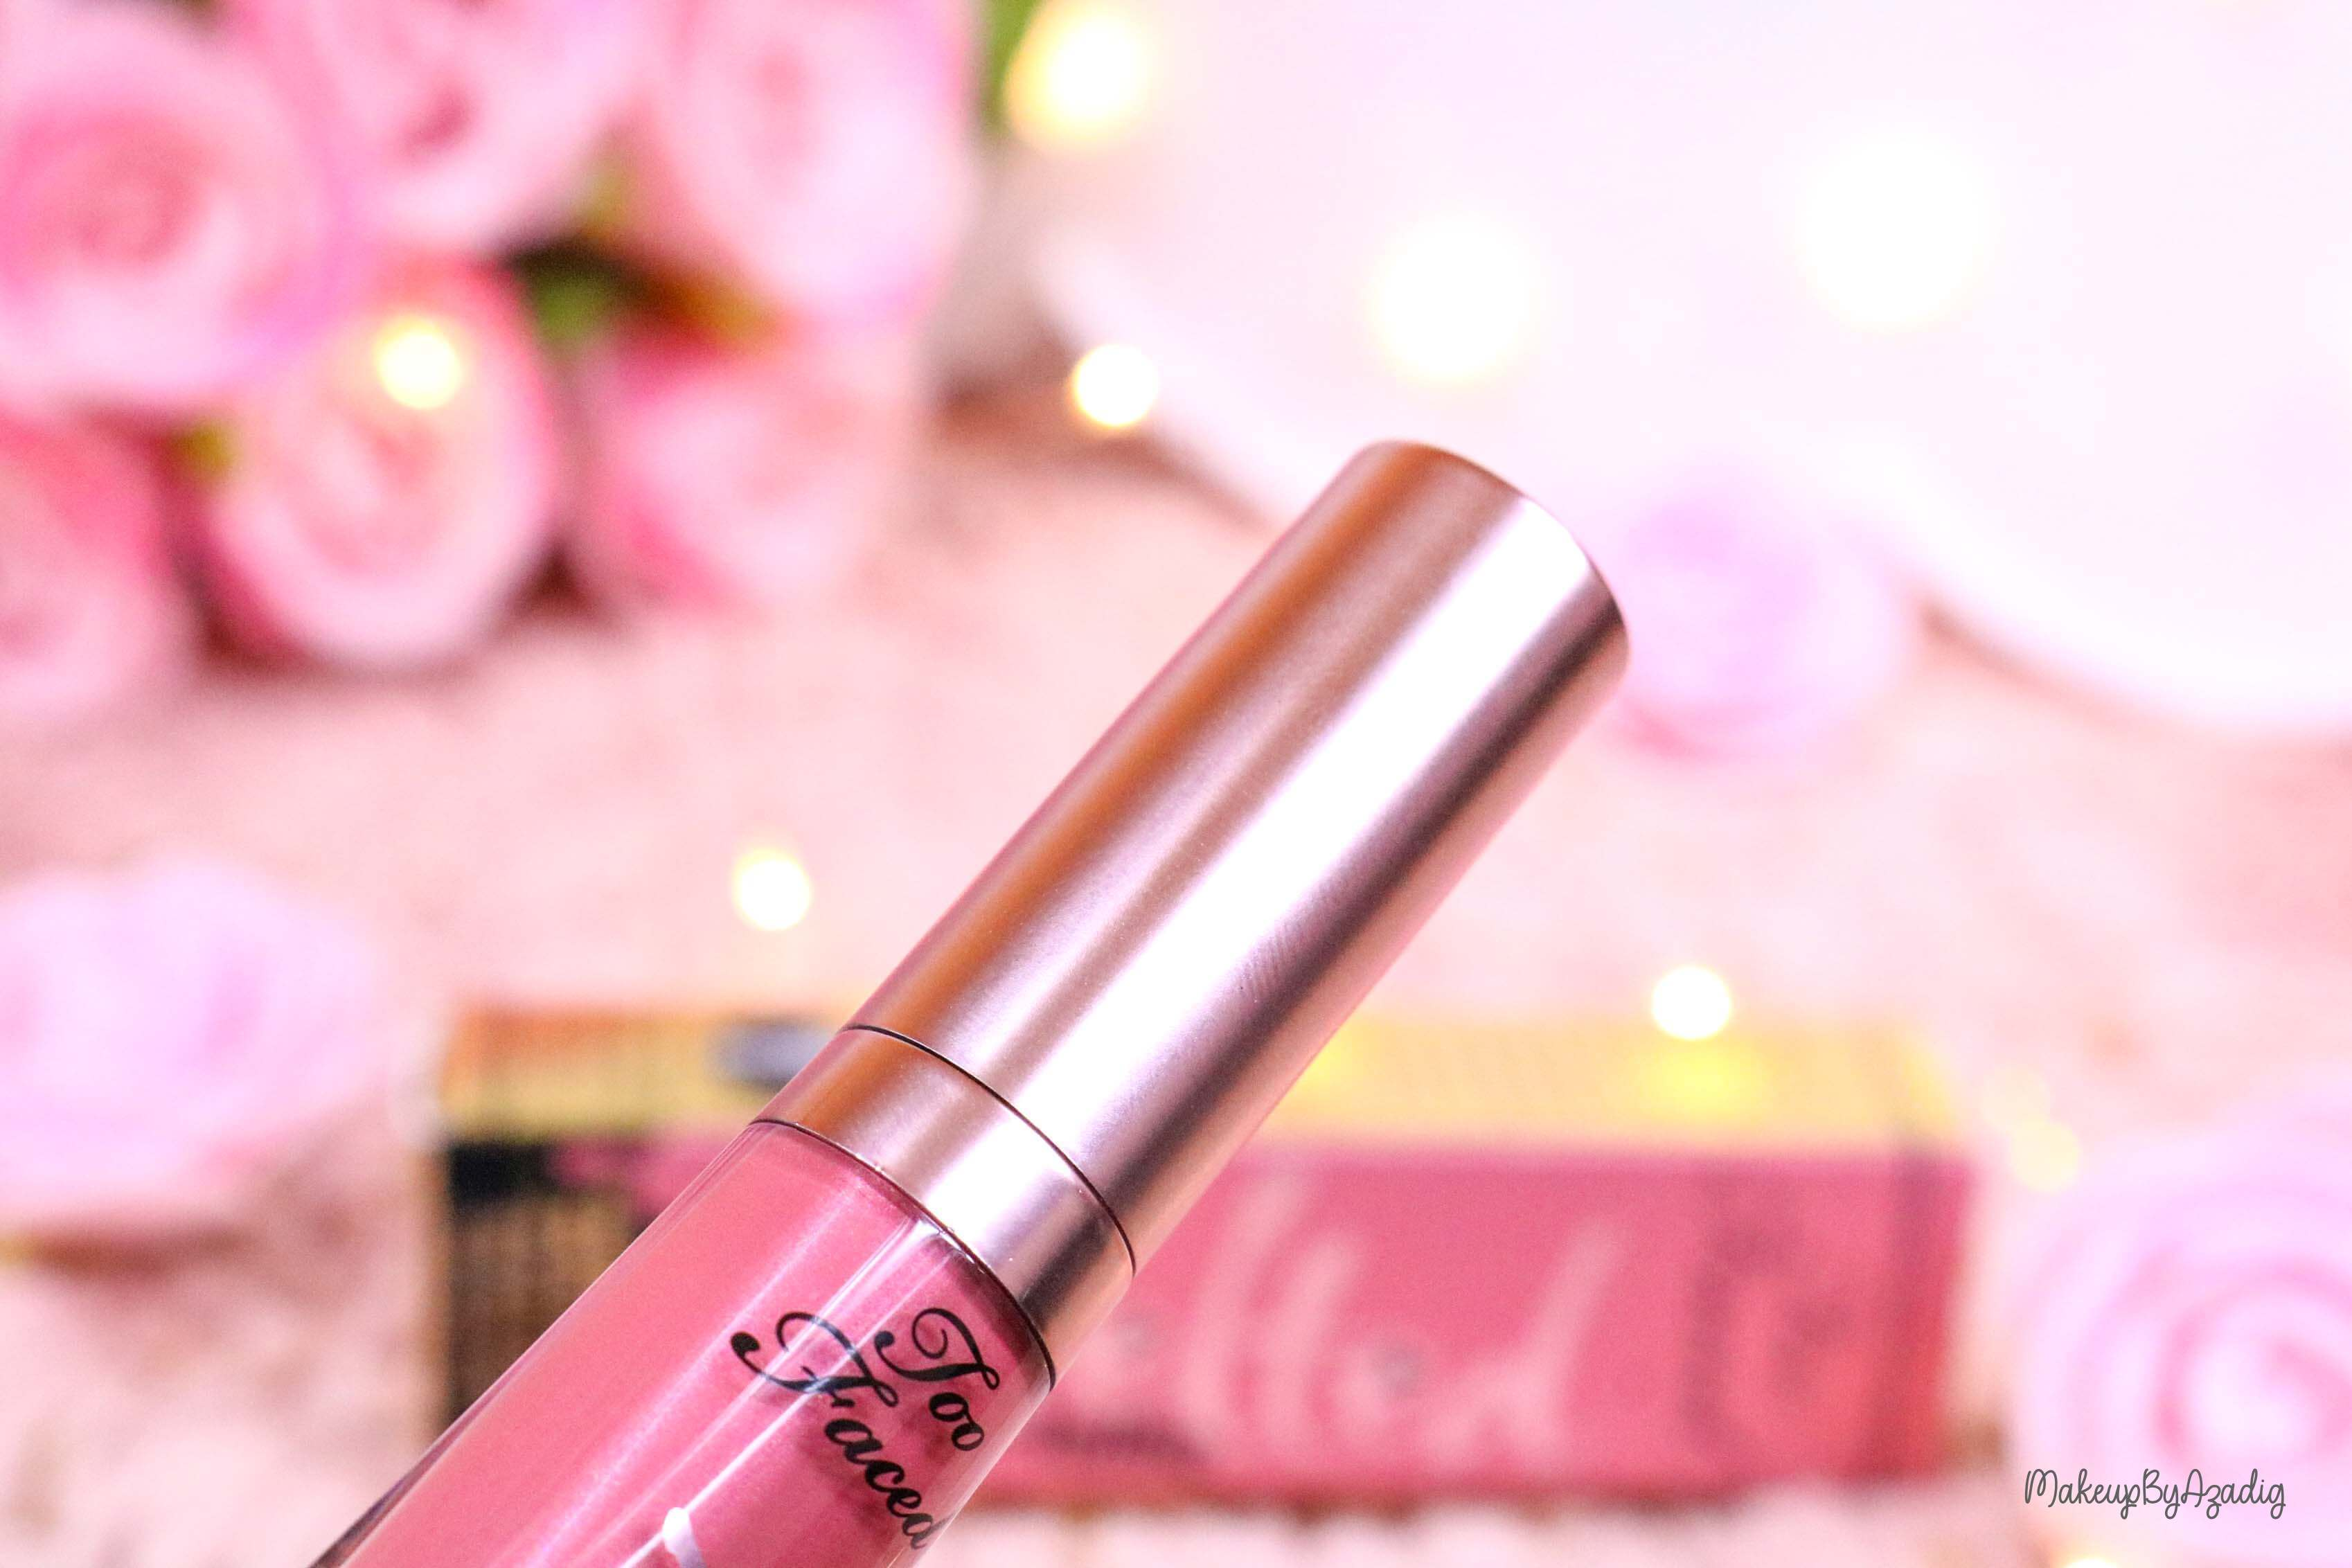 revue-melted-matte-tallic-rouge-a-levres-breakup-makeup-makeupbyazadig-sortie-france-influencer-swatch-avis-prix-rosegold